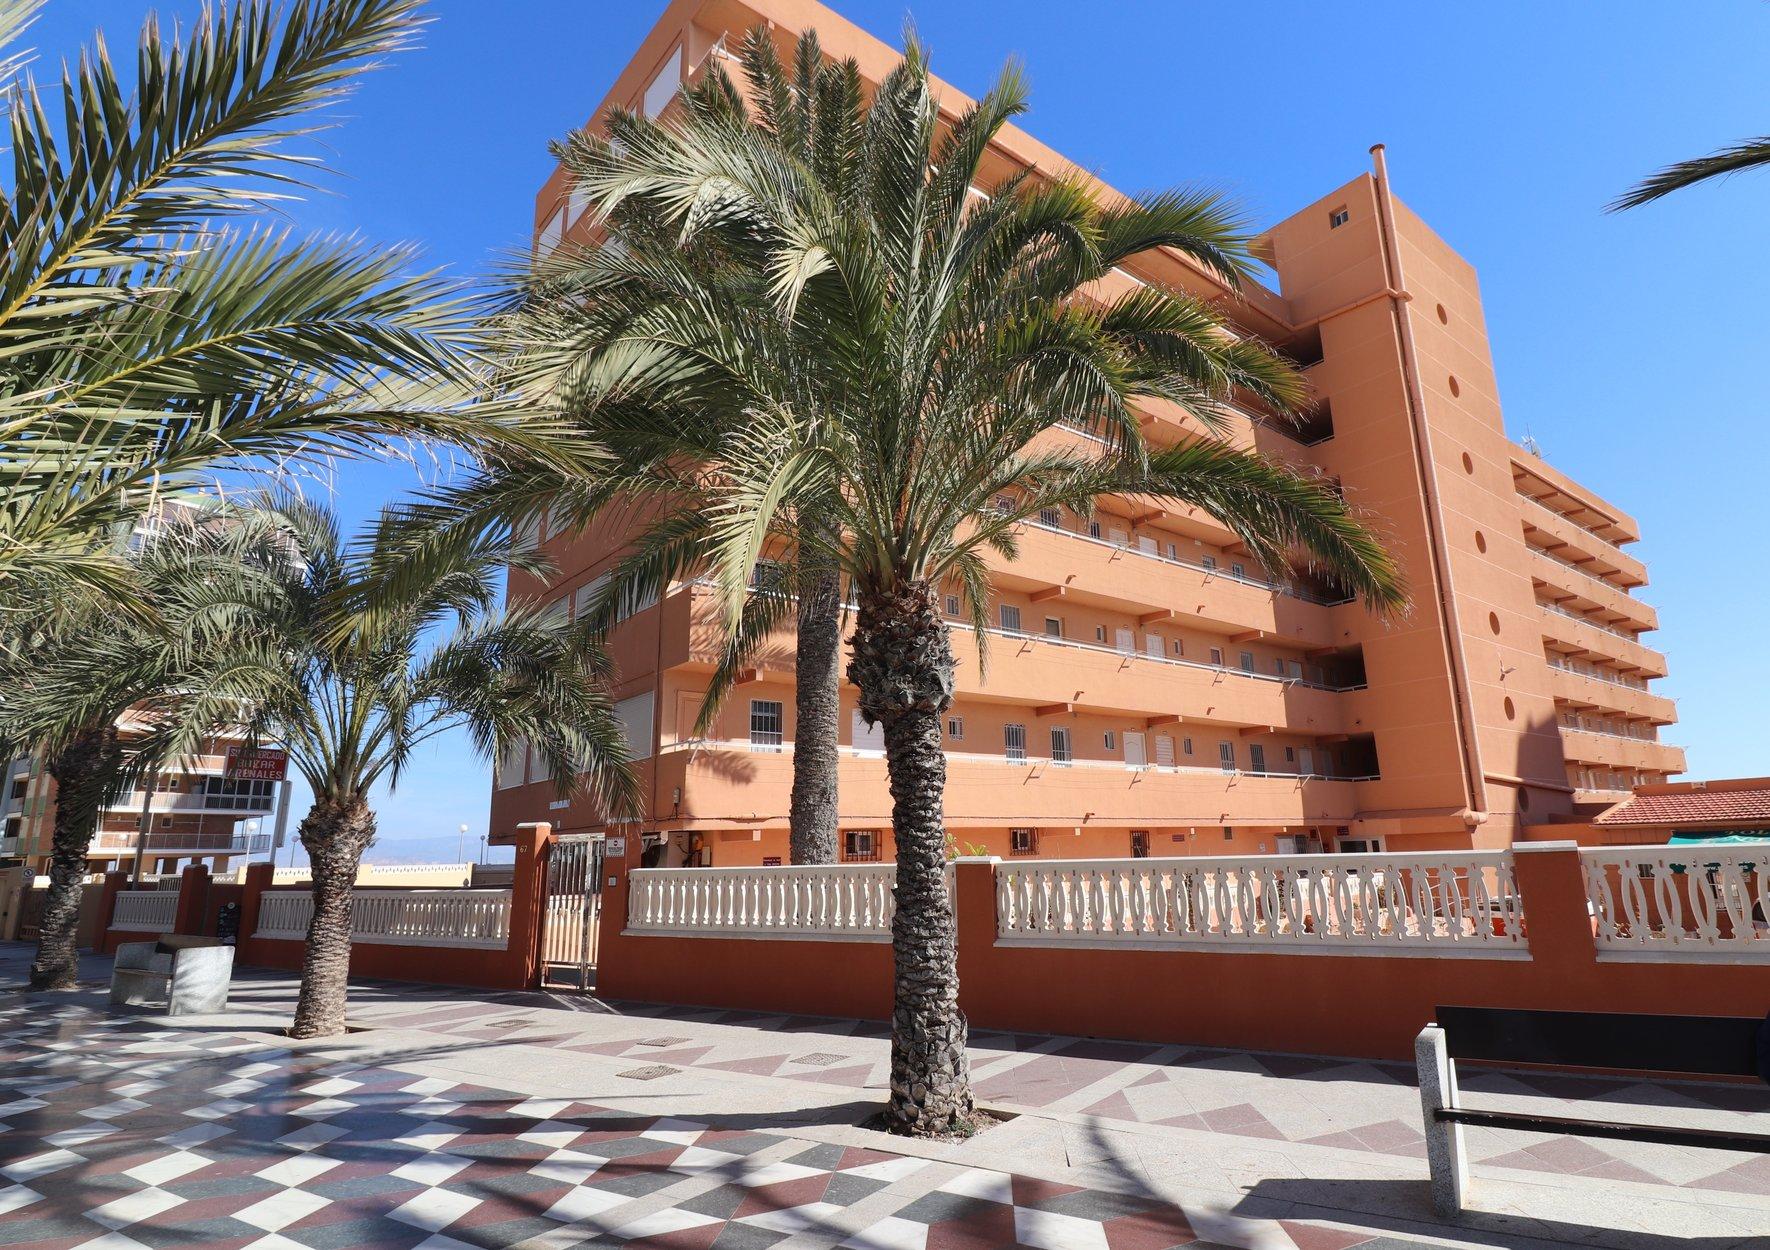 Apartment for sale in Arenales del Sol - Costa Blanca